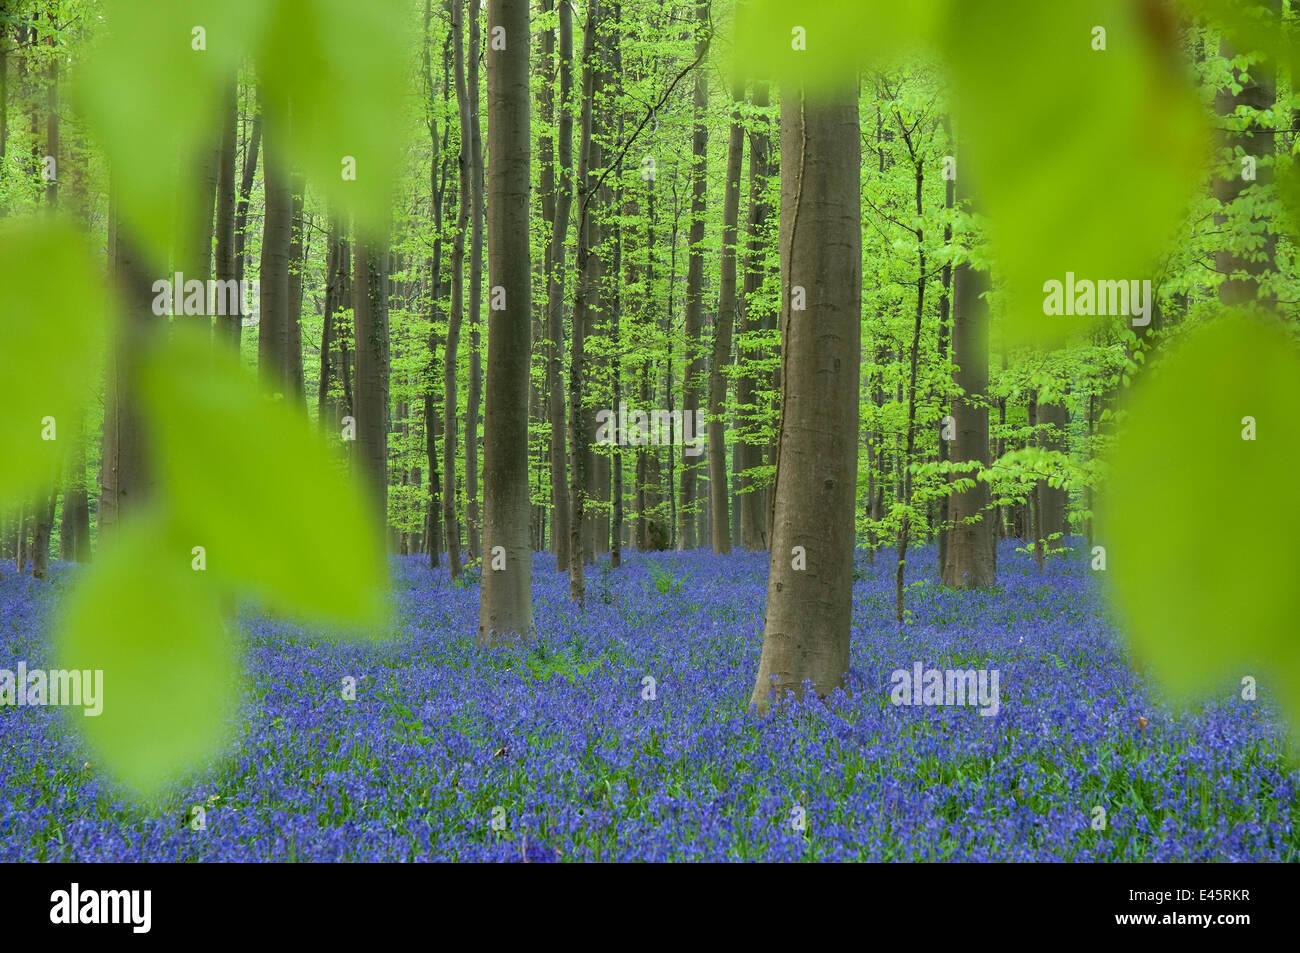 Bluebells (Hyacinthoides non-scripta / Endymion scriptum) flowering in Beech wood, Hallerbos, Belgium, April - Stock Image